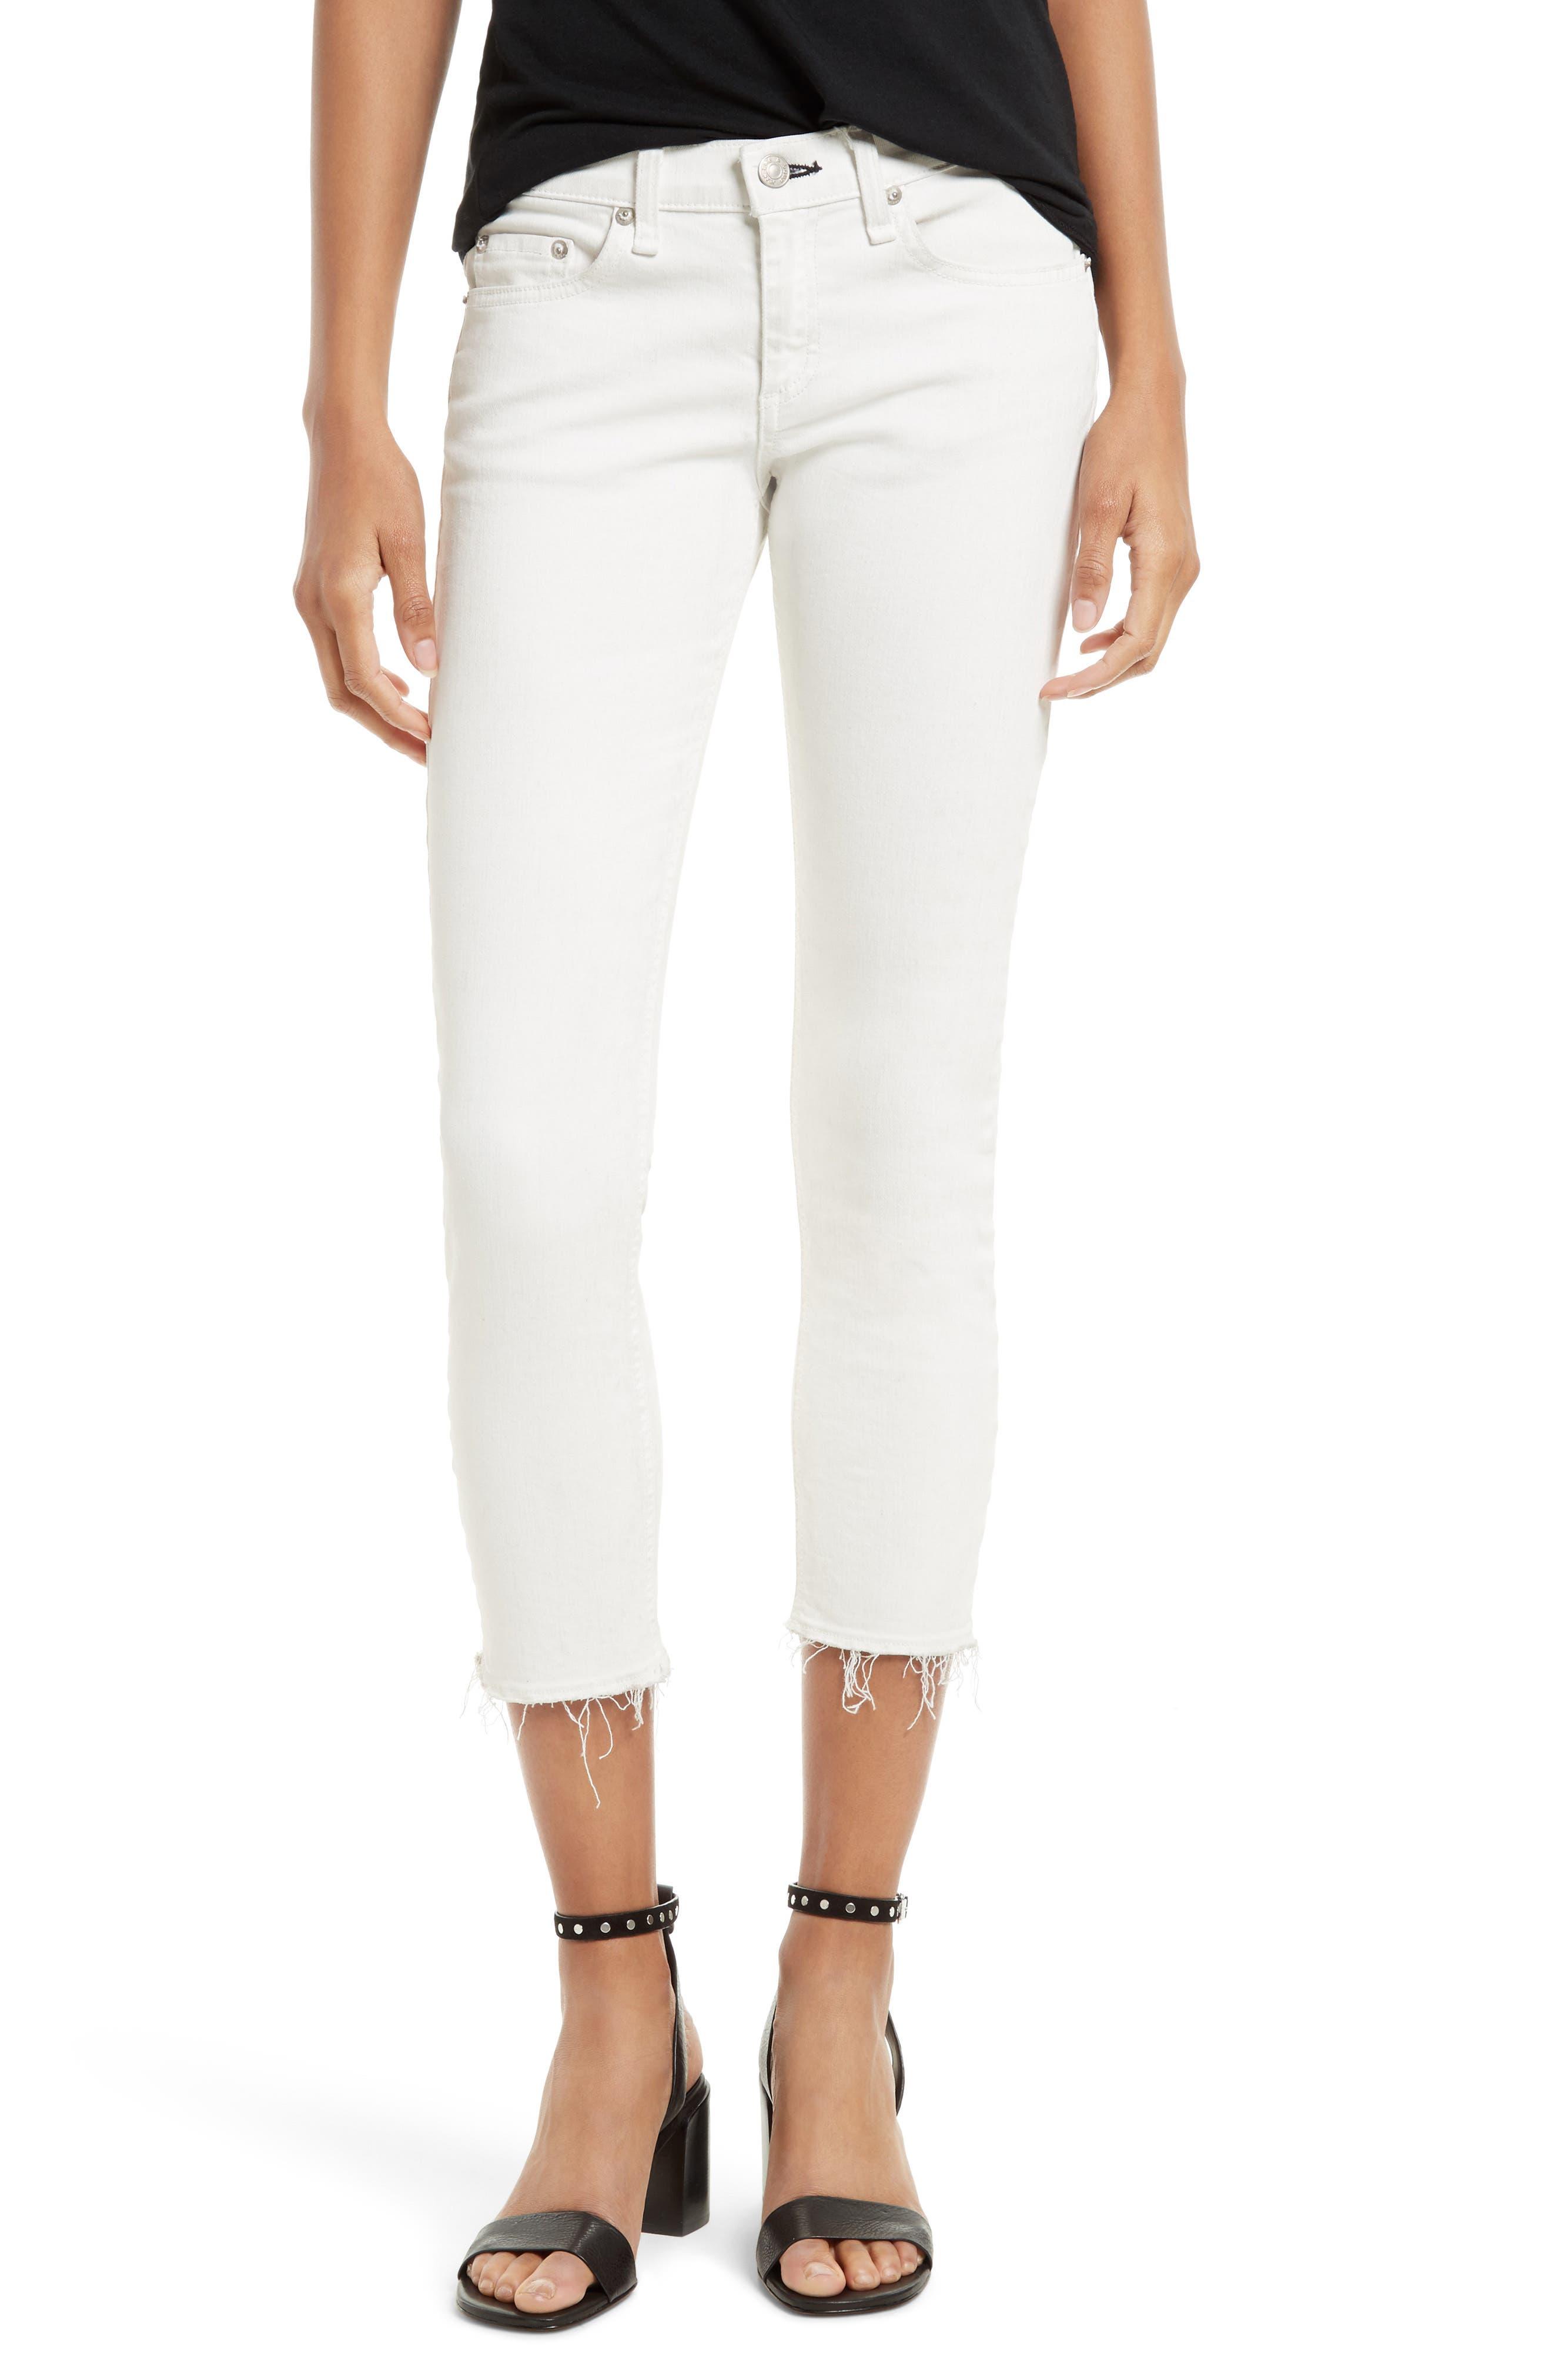 Capri Skinny Jeans,                             Main thumbnail 1, color,                             100